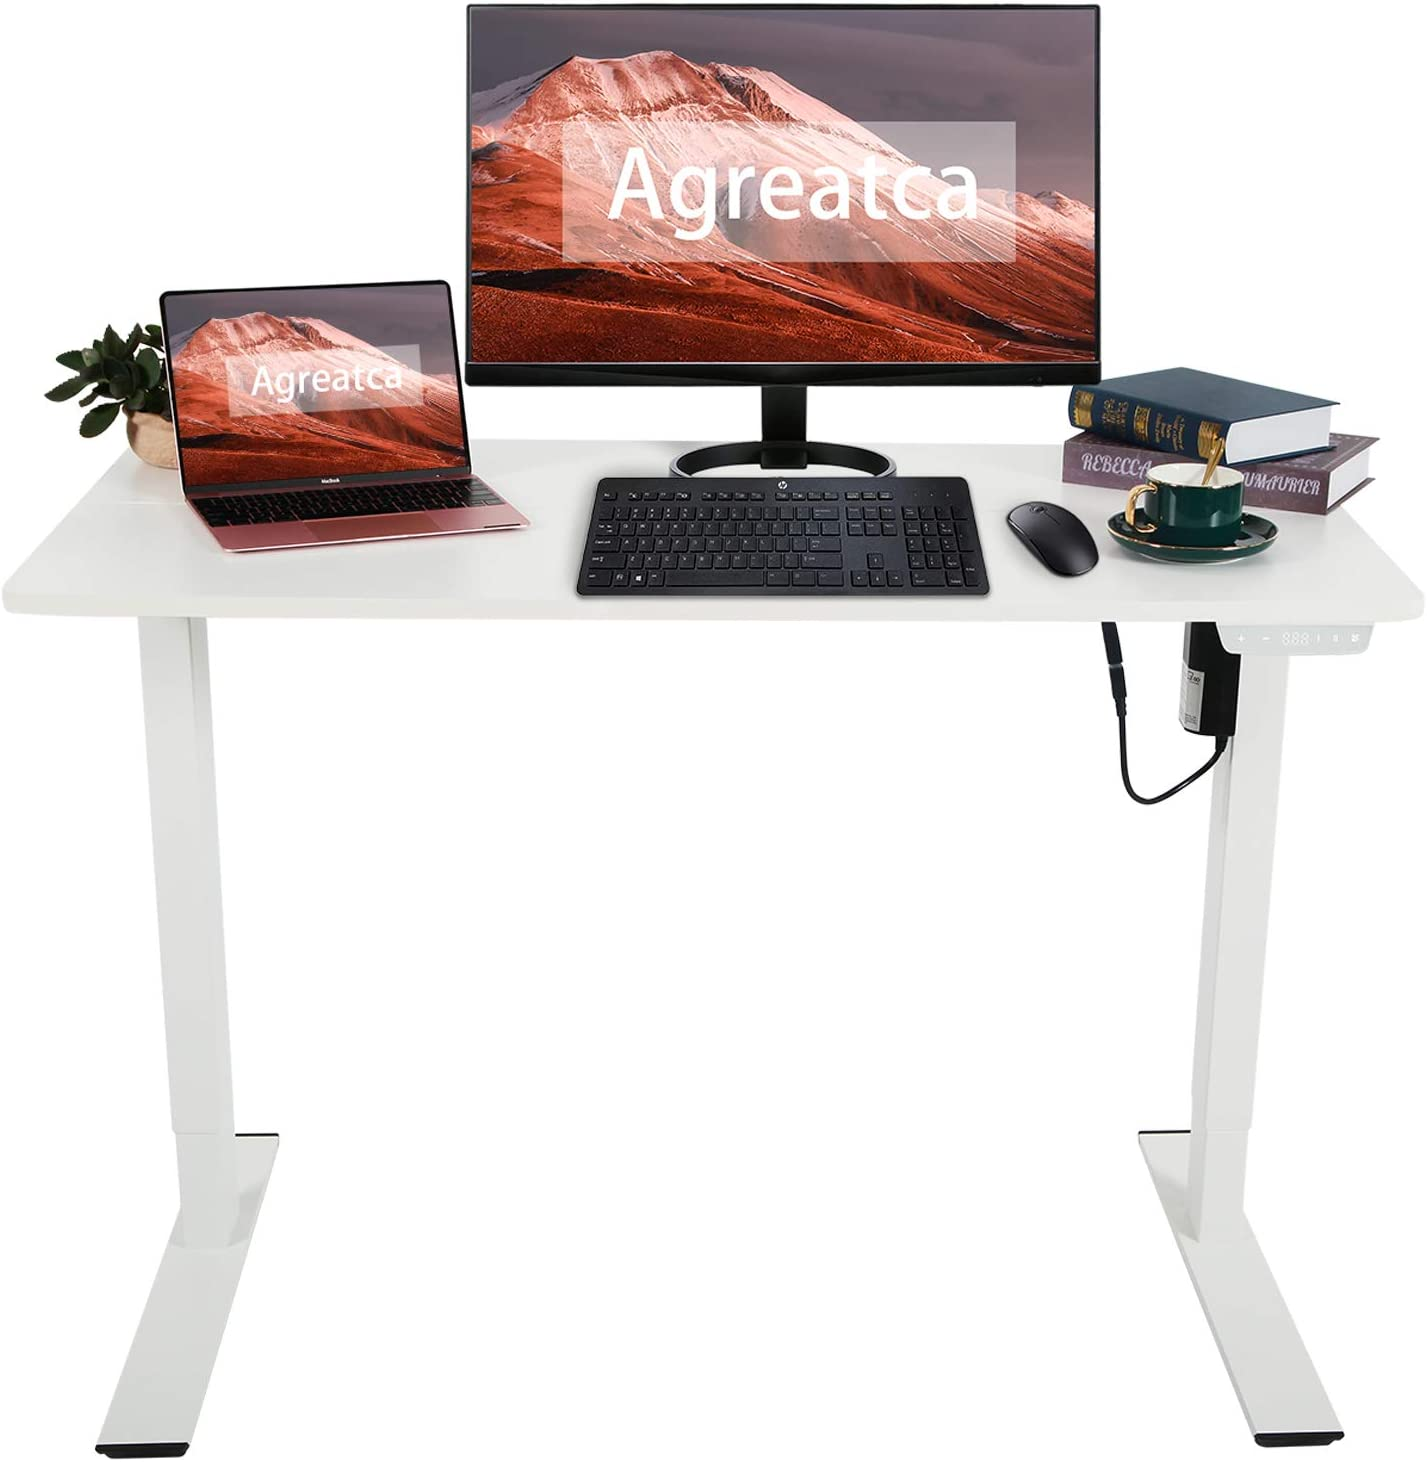 Agreatca Electric Standing Desk Height 超特価SALE開催 24 Inch Adjustable 信用 48 x